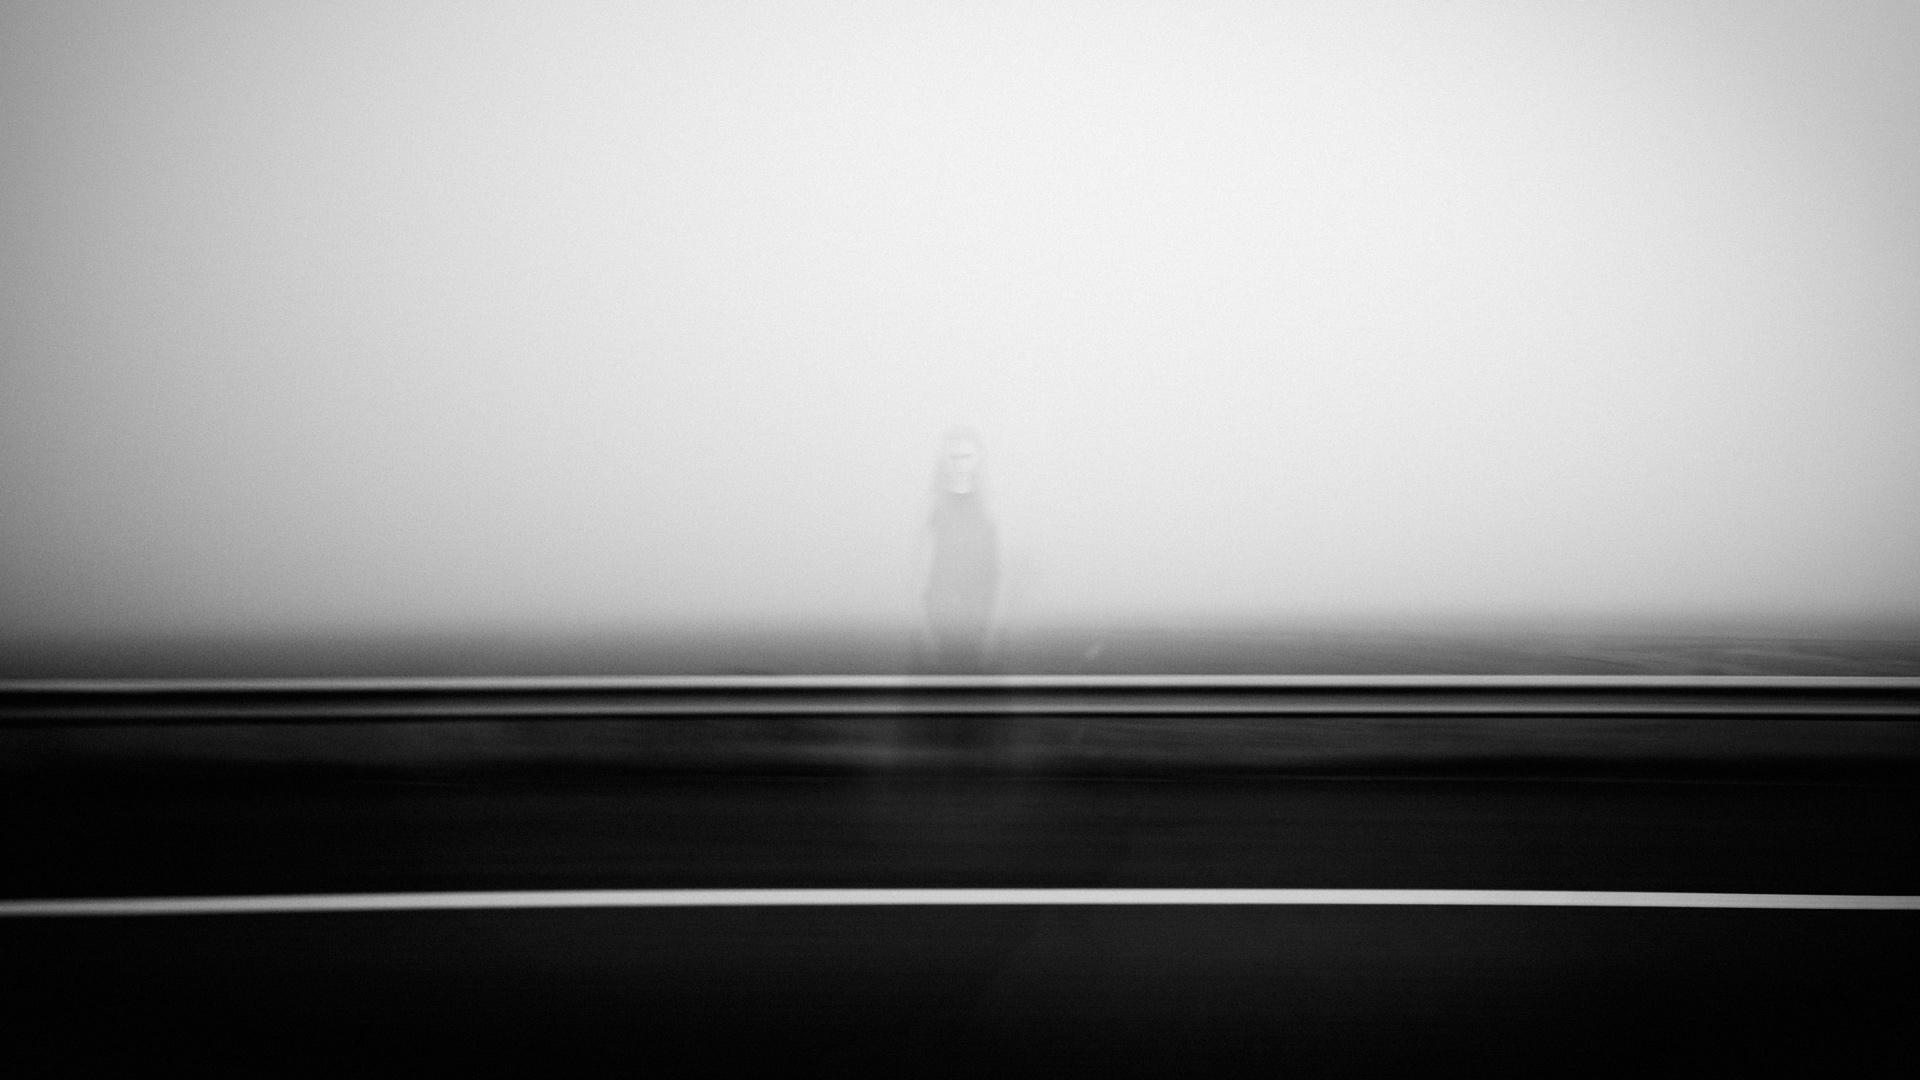 Don't Be Afraid - 2013 - Geoffrey Mitre Photographie